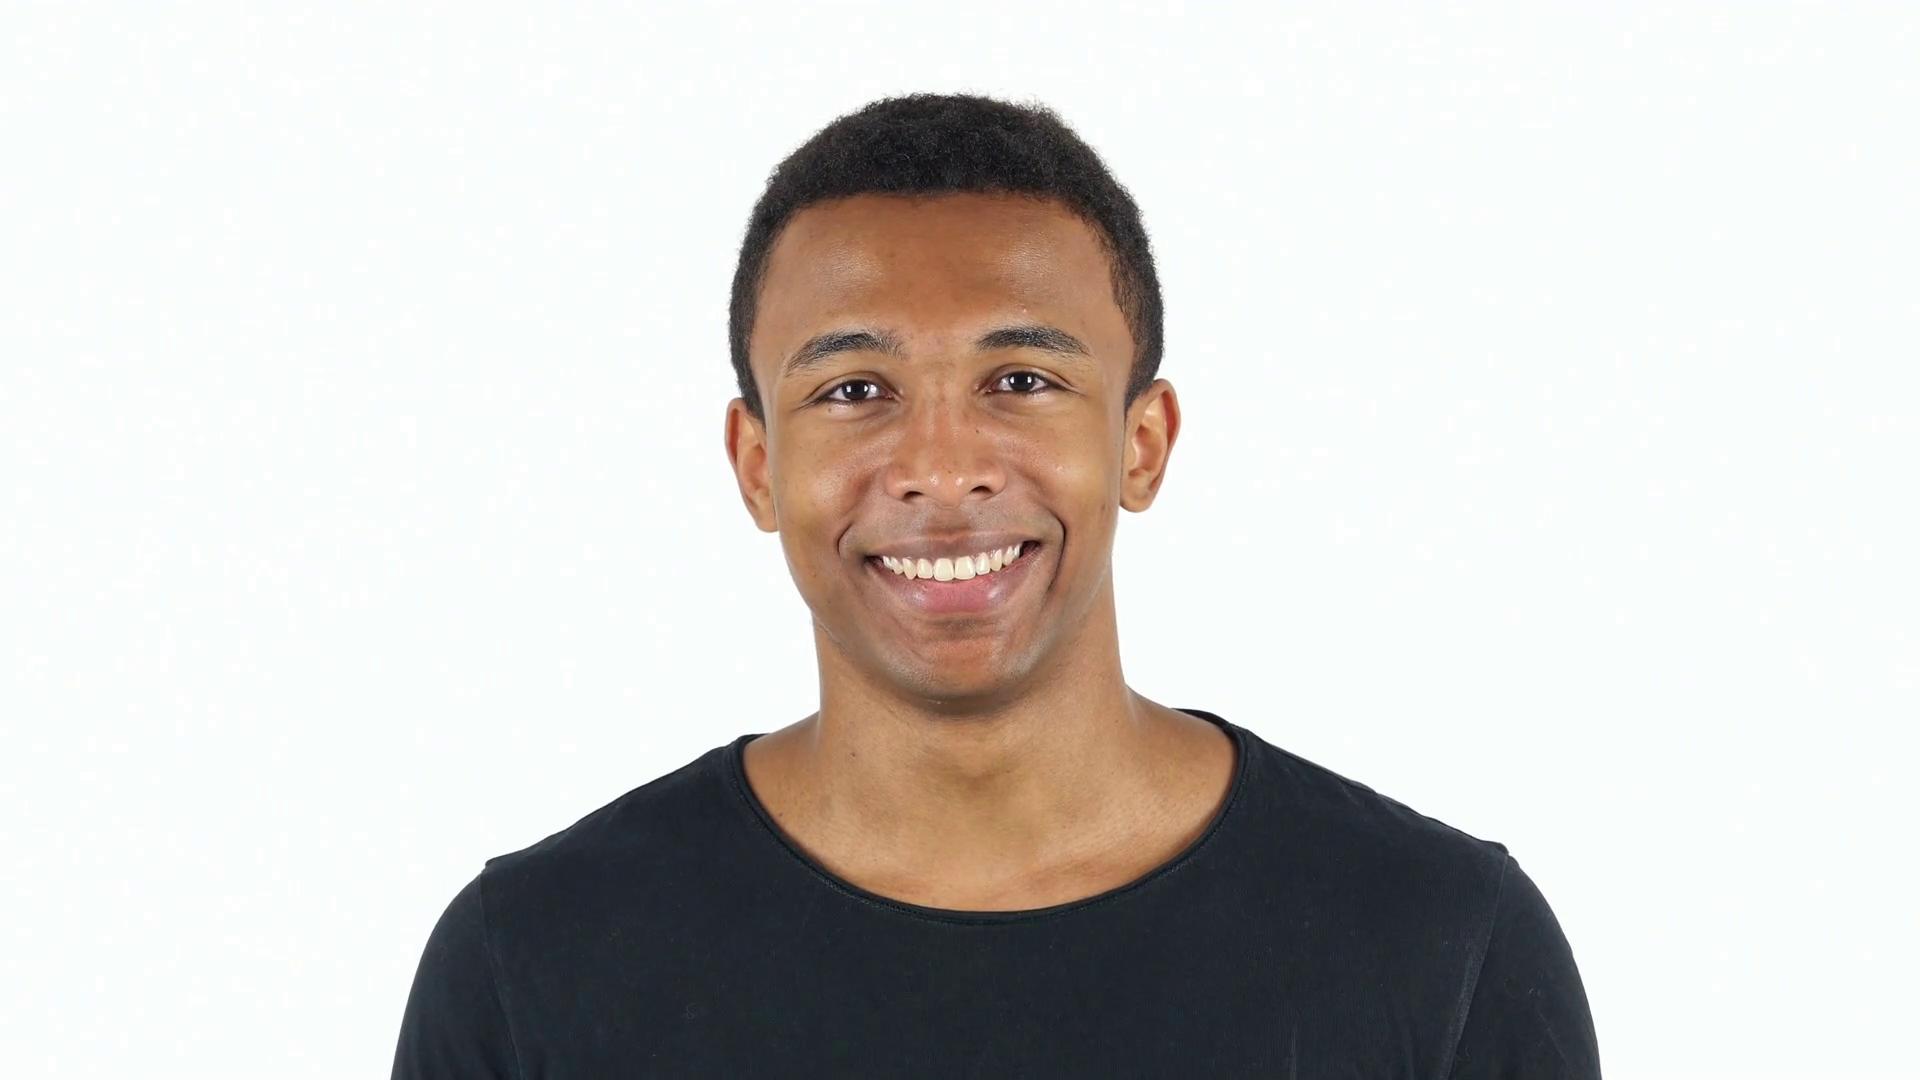 Smiling Black Man on White Background Stock Video Footage - Videoblocks